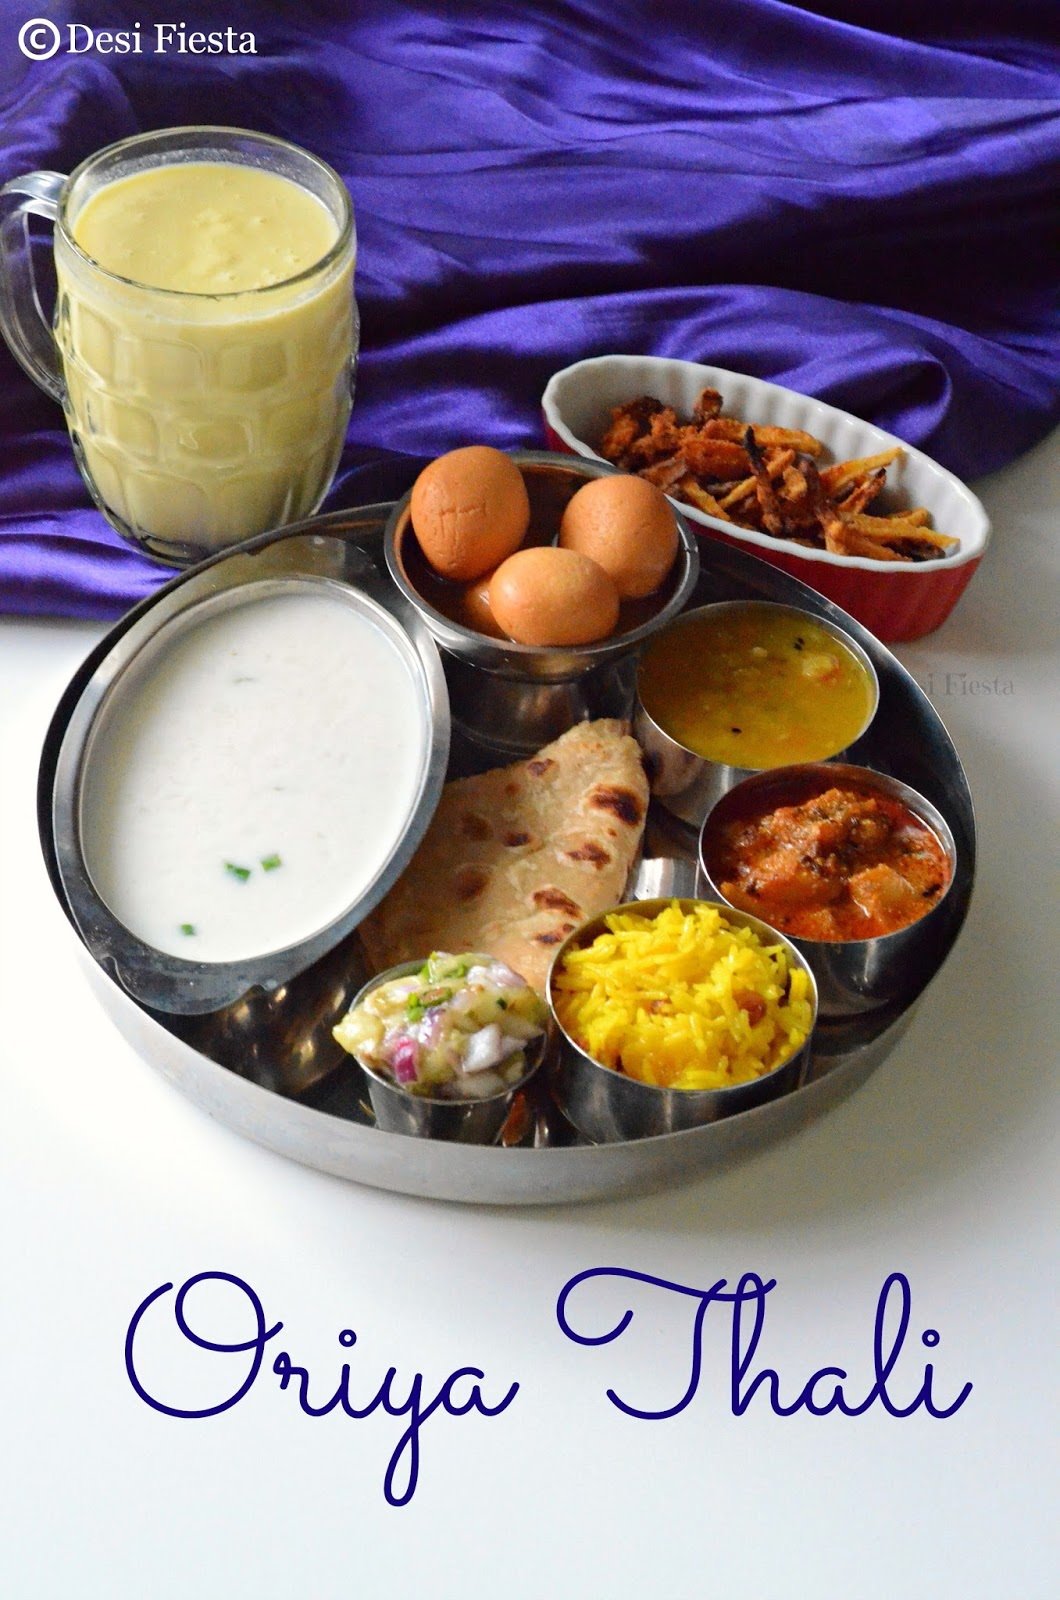 Oriya thali orissa cuisine desi fiesta orissa cuisine forumfinder Image collections